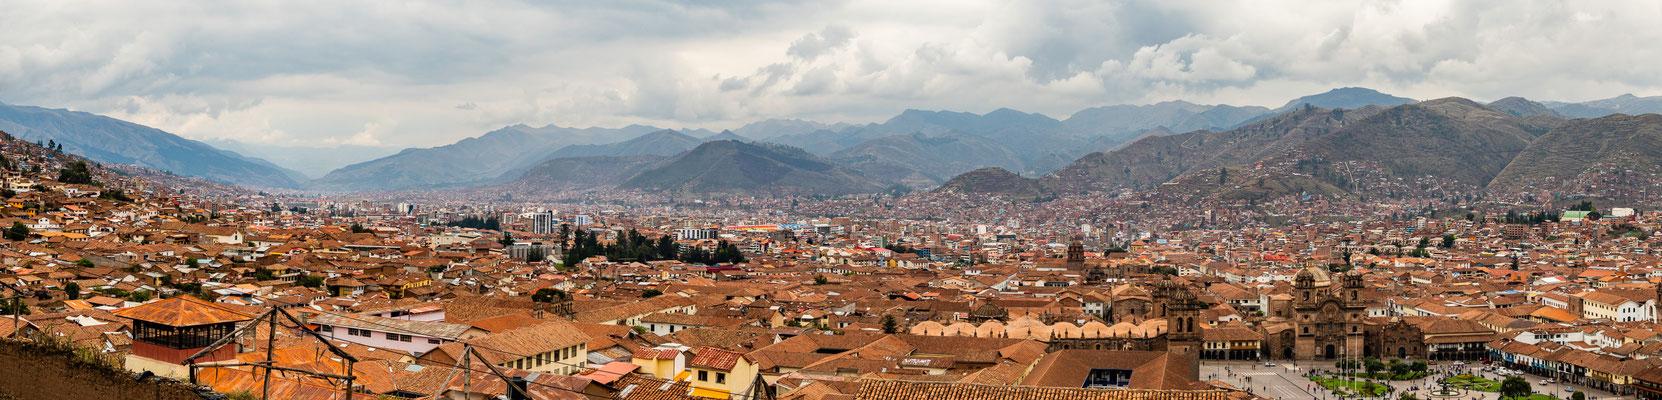 12. Nov.   Cusco: Panorama vom Mirador San Cristobal